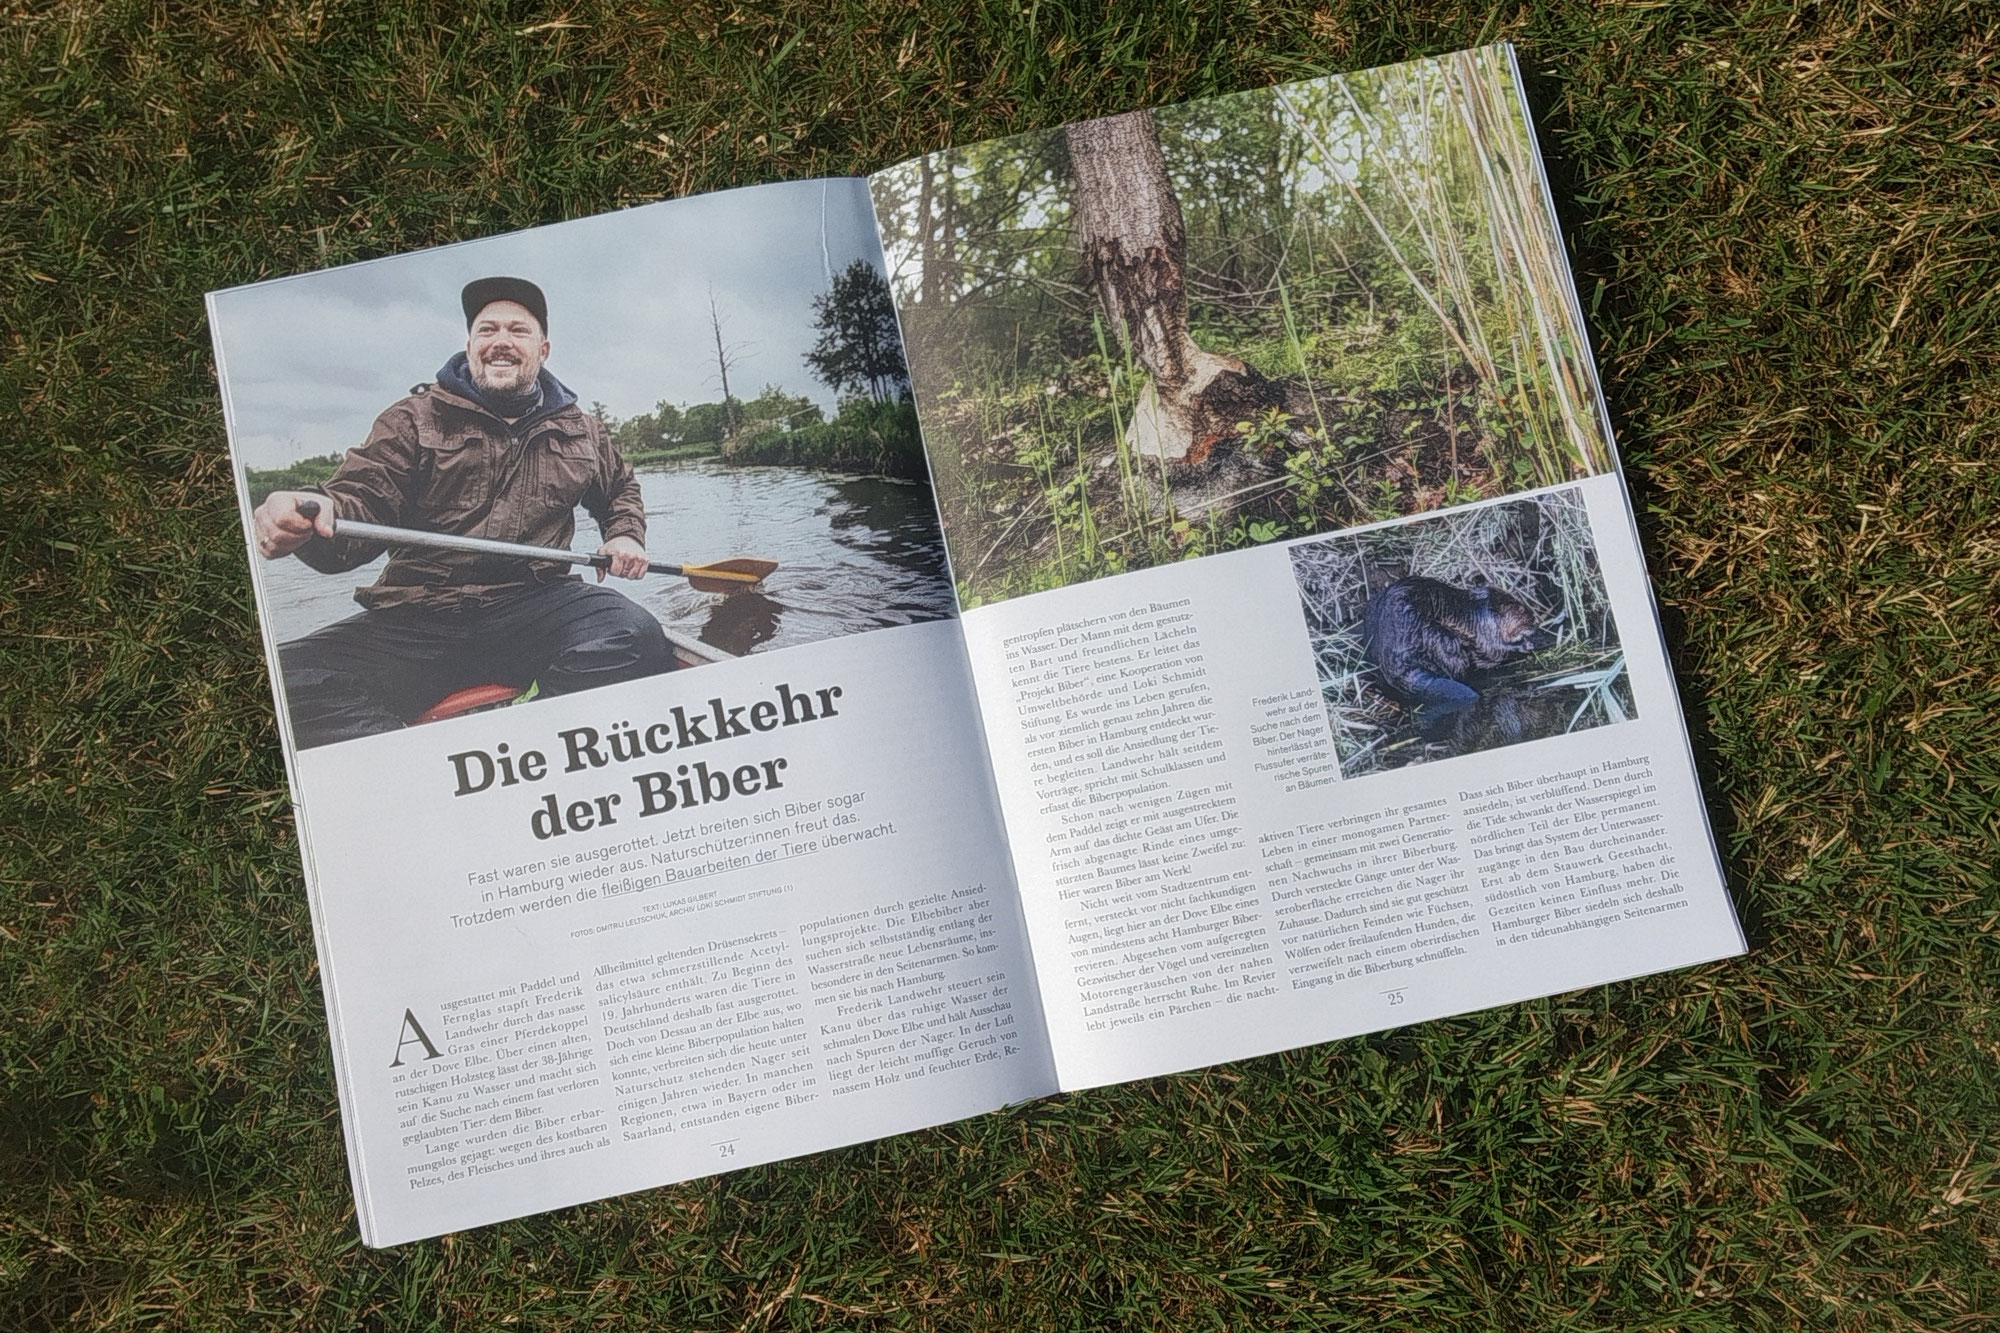 Unsere Elbe - Über Biber, Mikroplastik & Co.